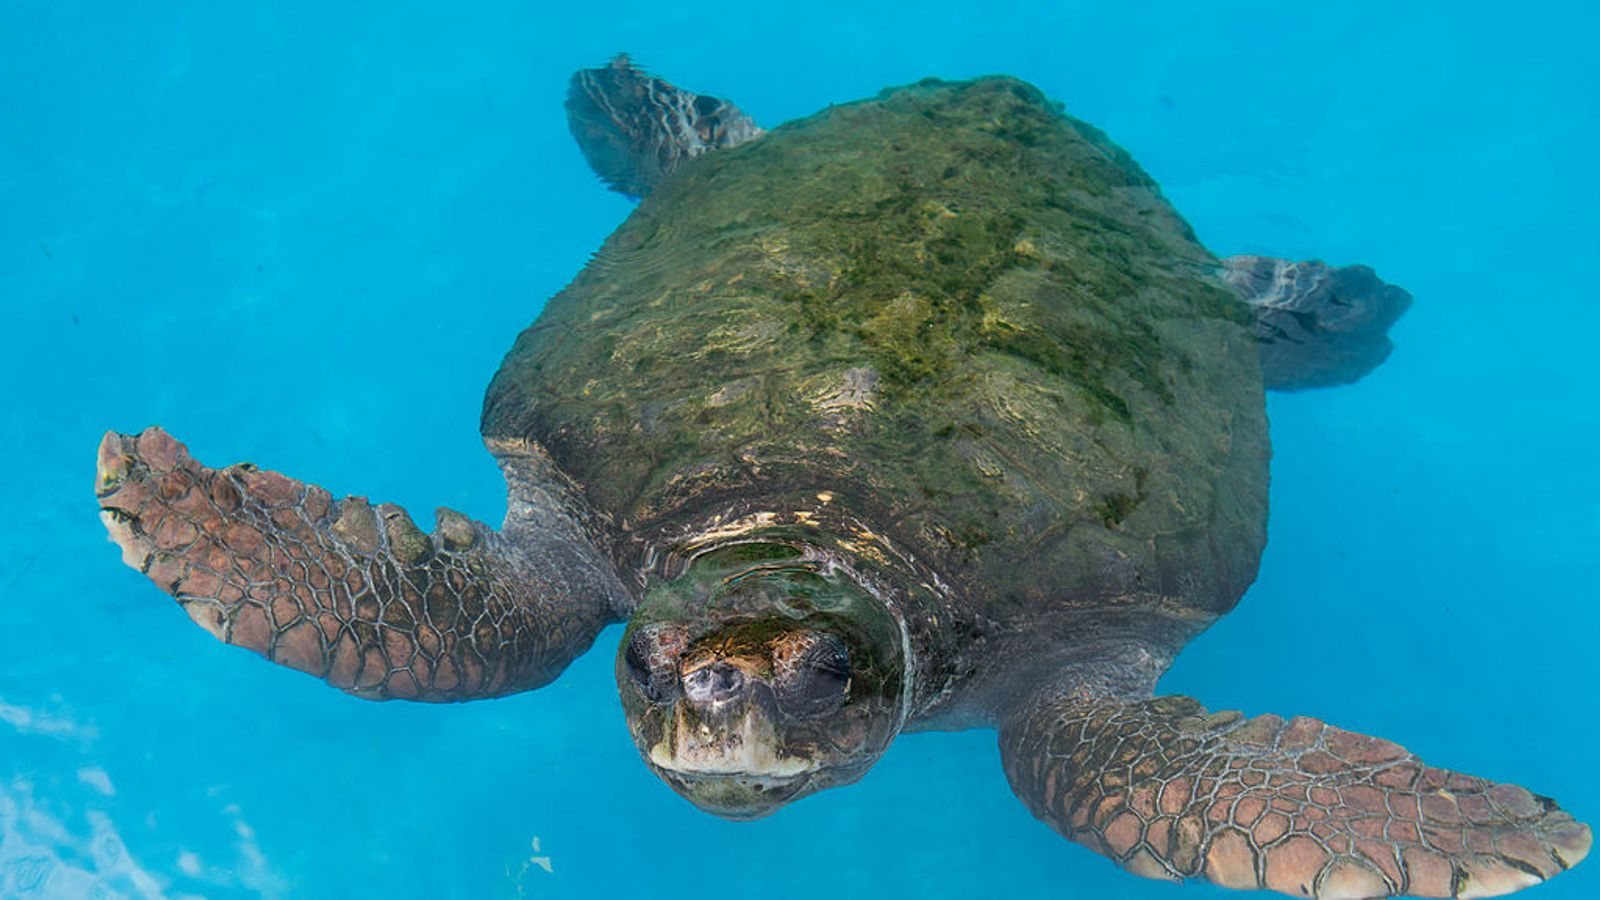 351 sea turtles found dead on same coastline as mass sea lion beaching